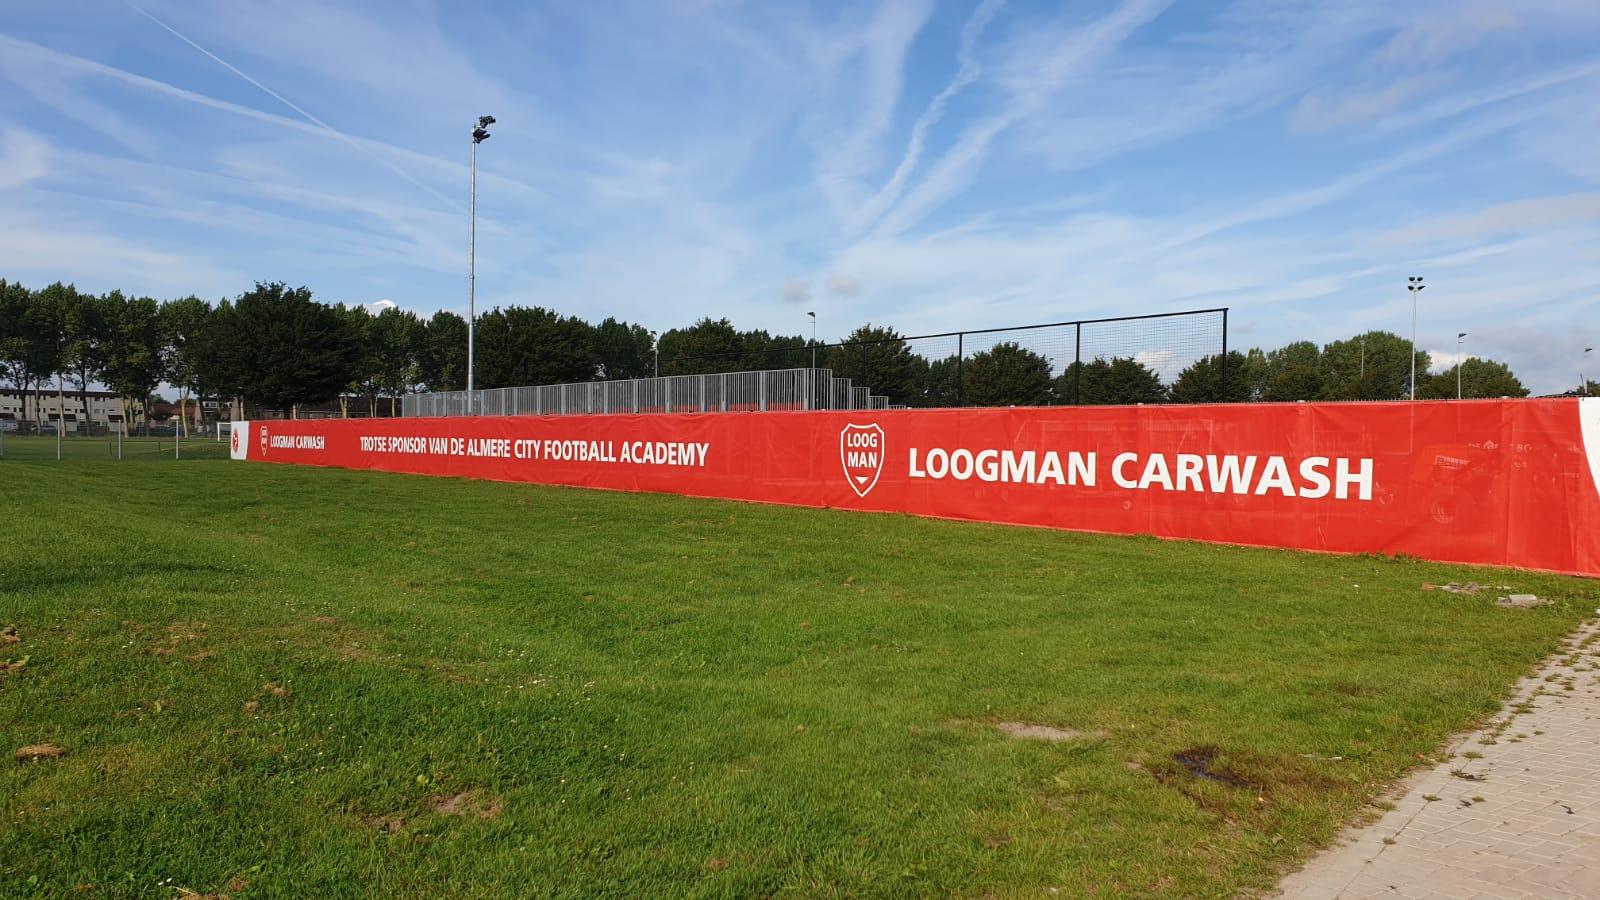 Kom alles te weten over de Almere City FC Football Academy!